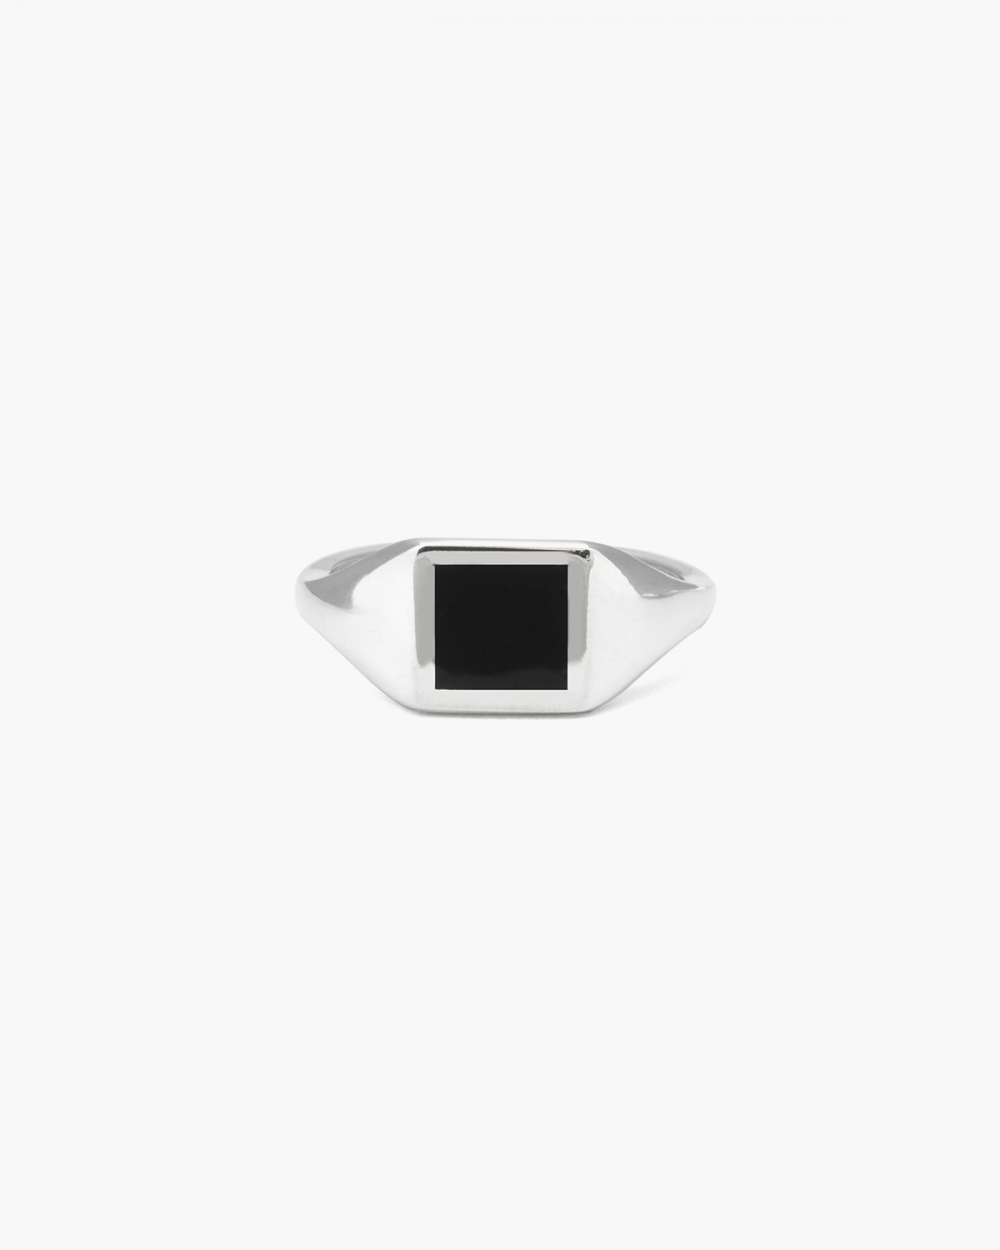 Rings SQUARE BLACK ENAMEL SIGNET PINKY RING NOVE25